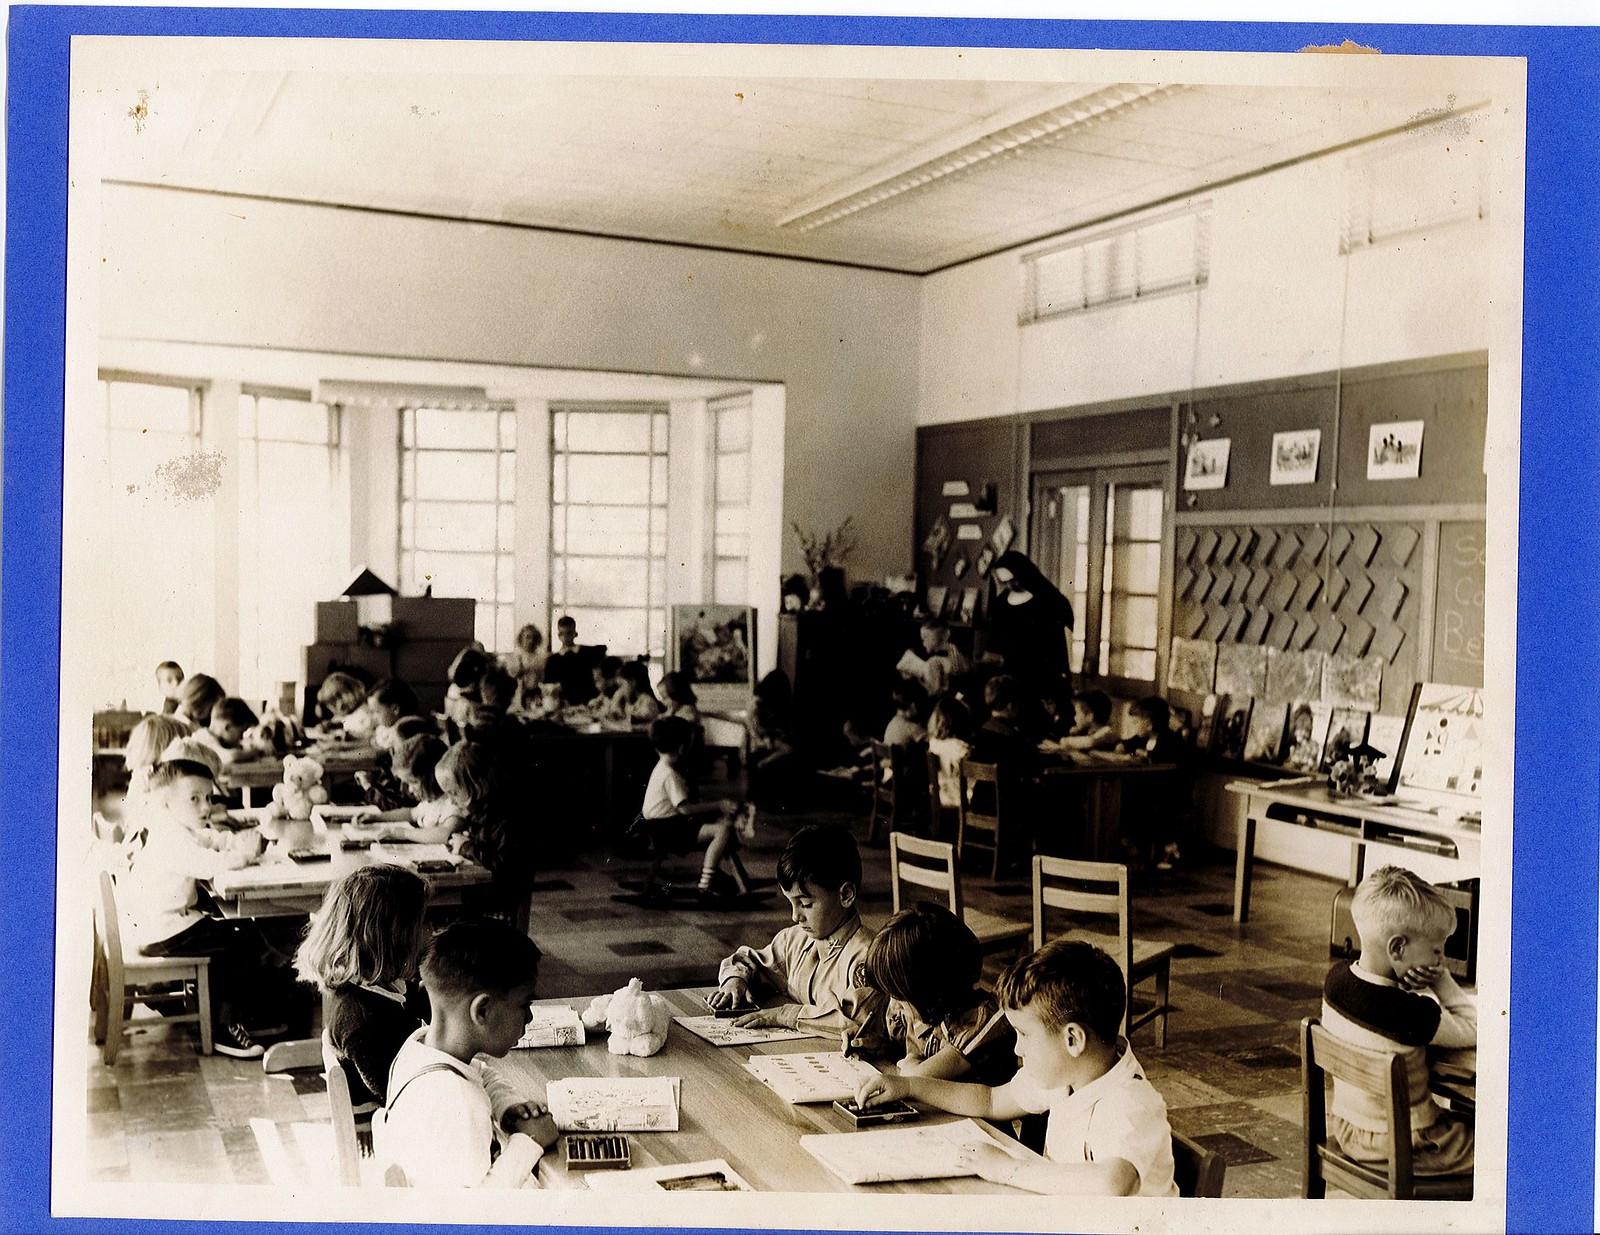 SMCS Old School Images